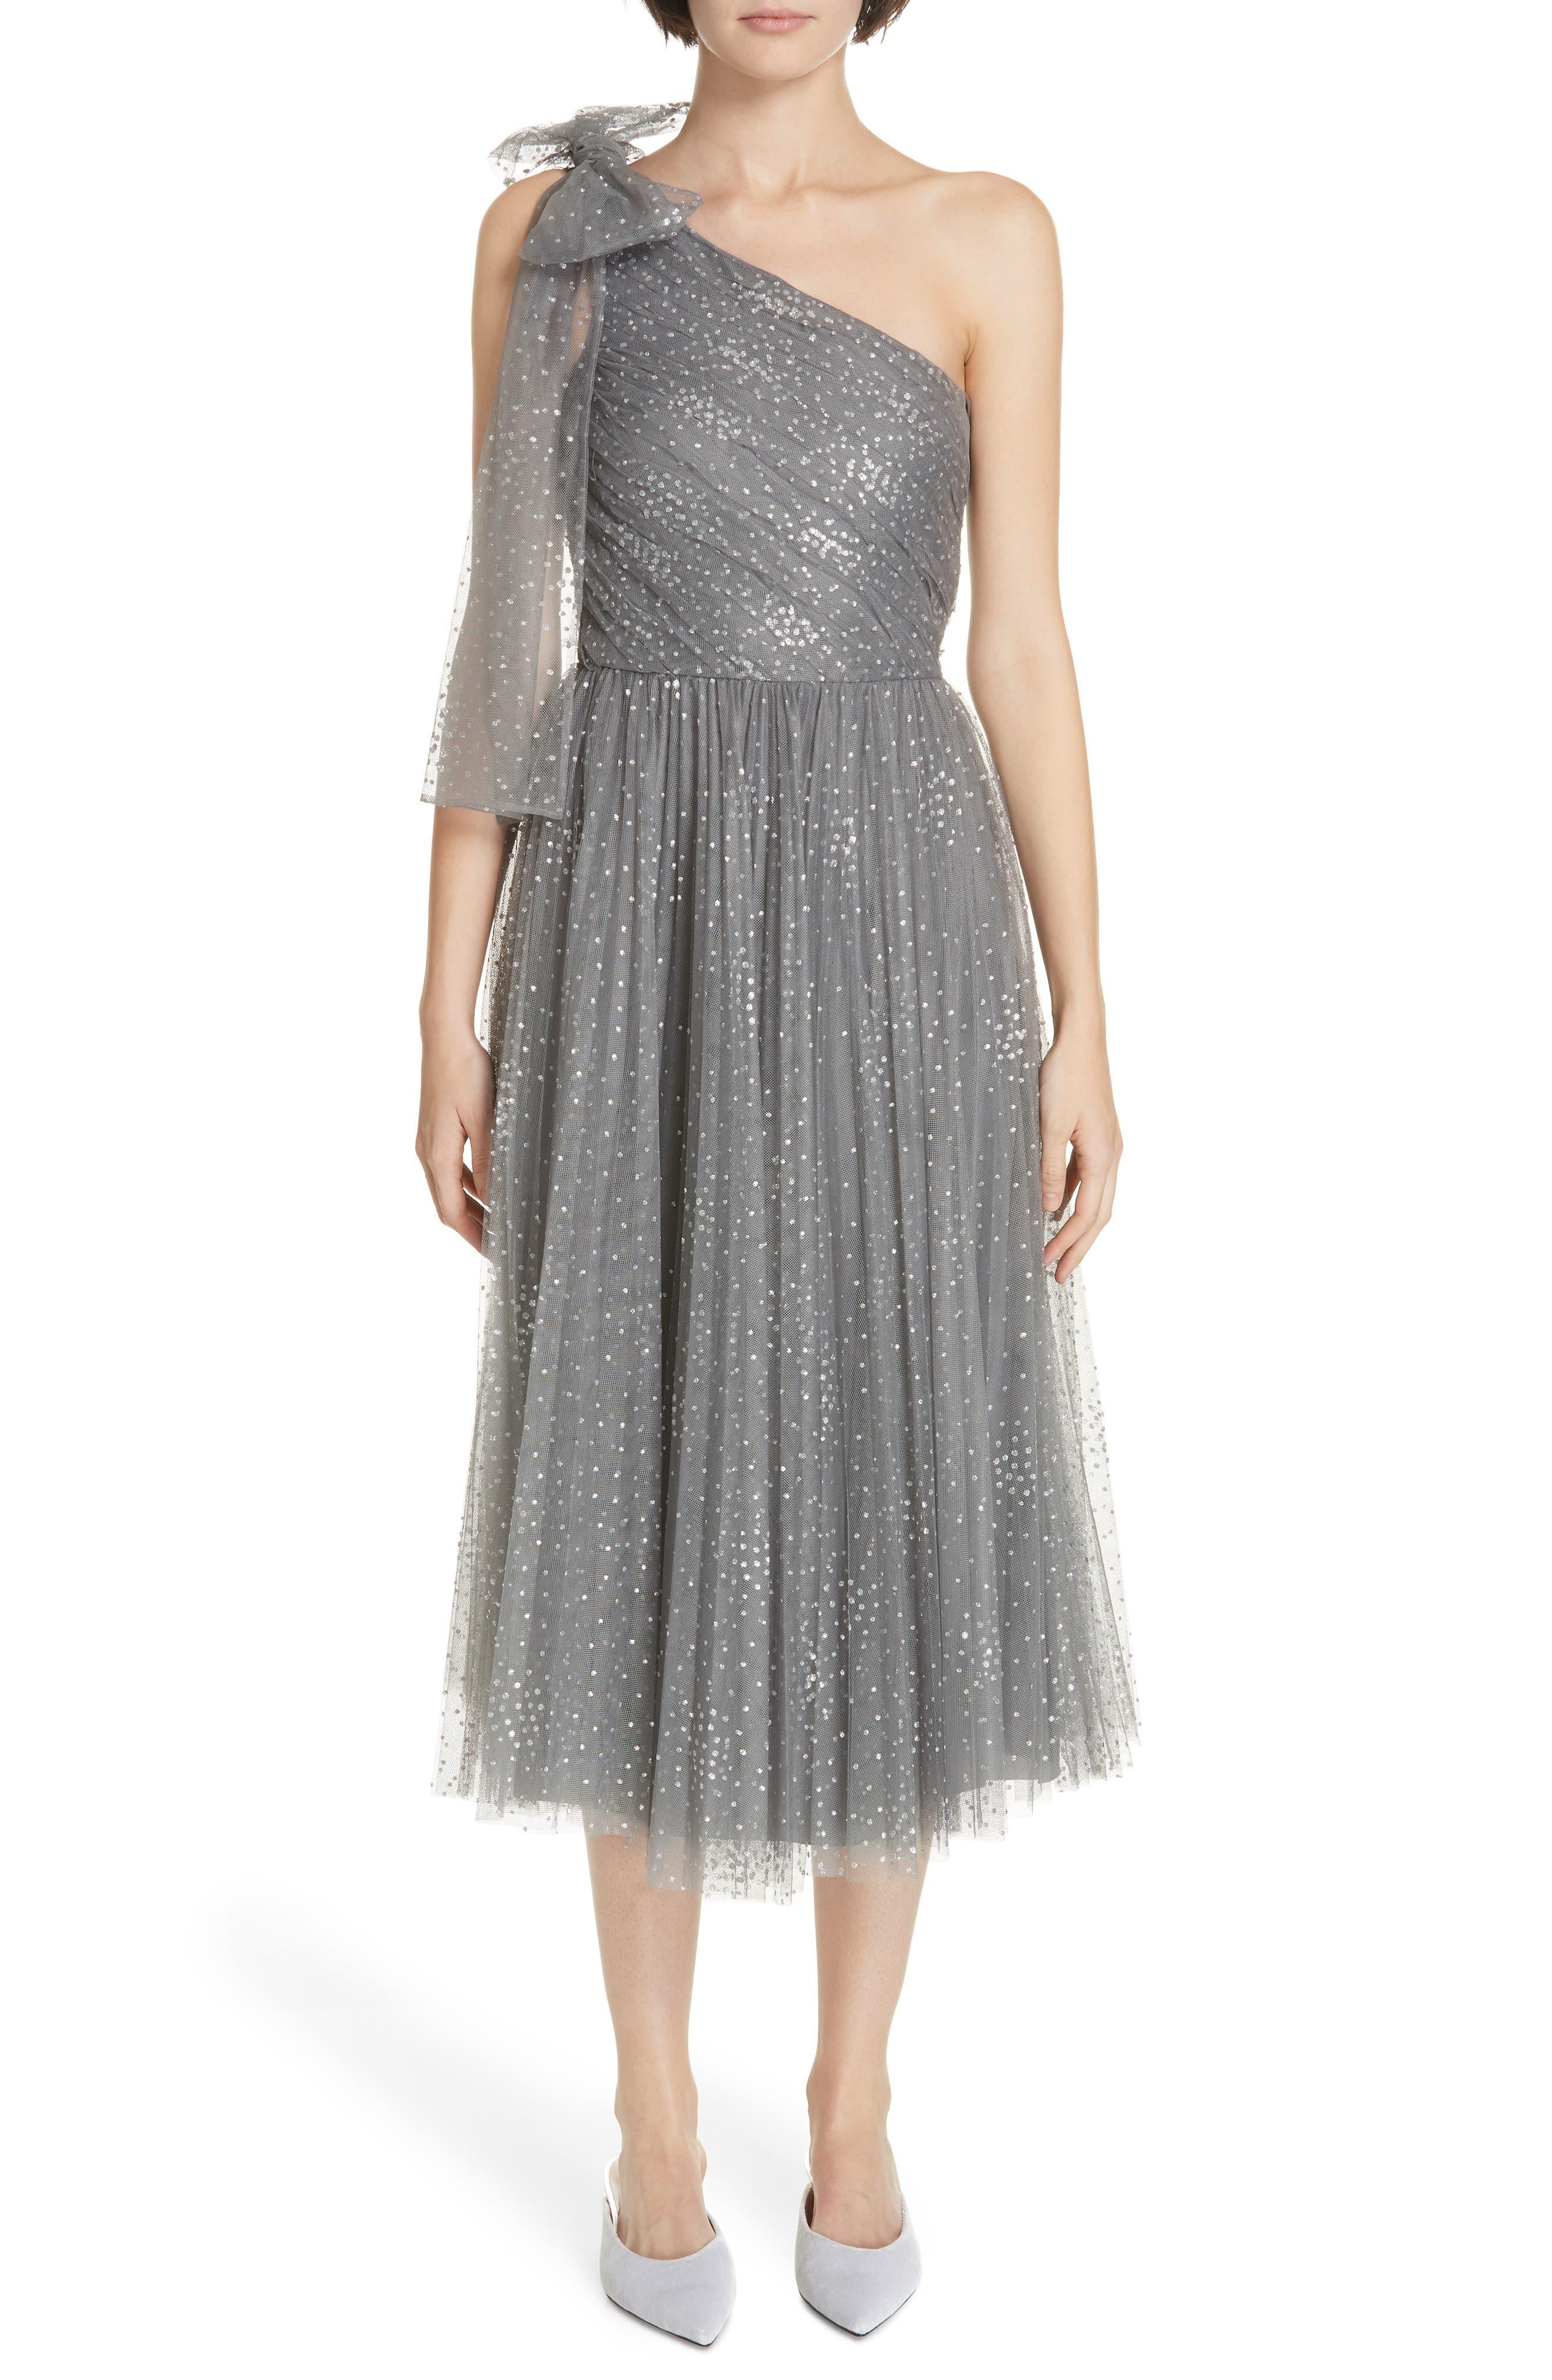 Red Valentino Metallic One-Shoulder A-Line Dress, 0 6IT - Grey